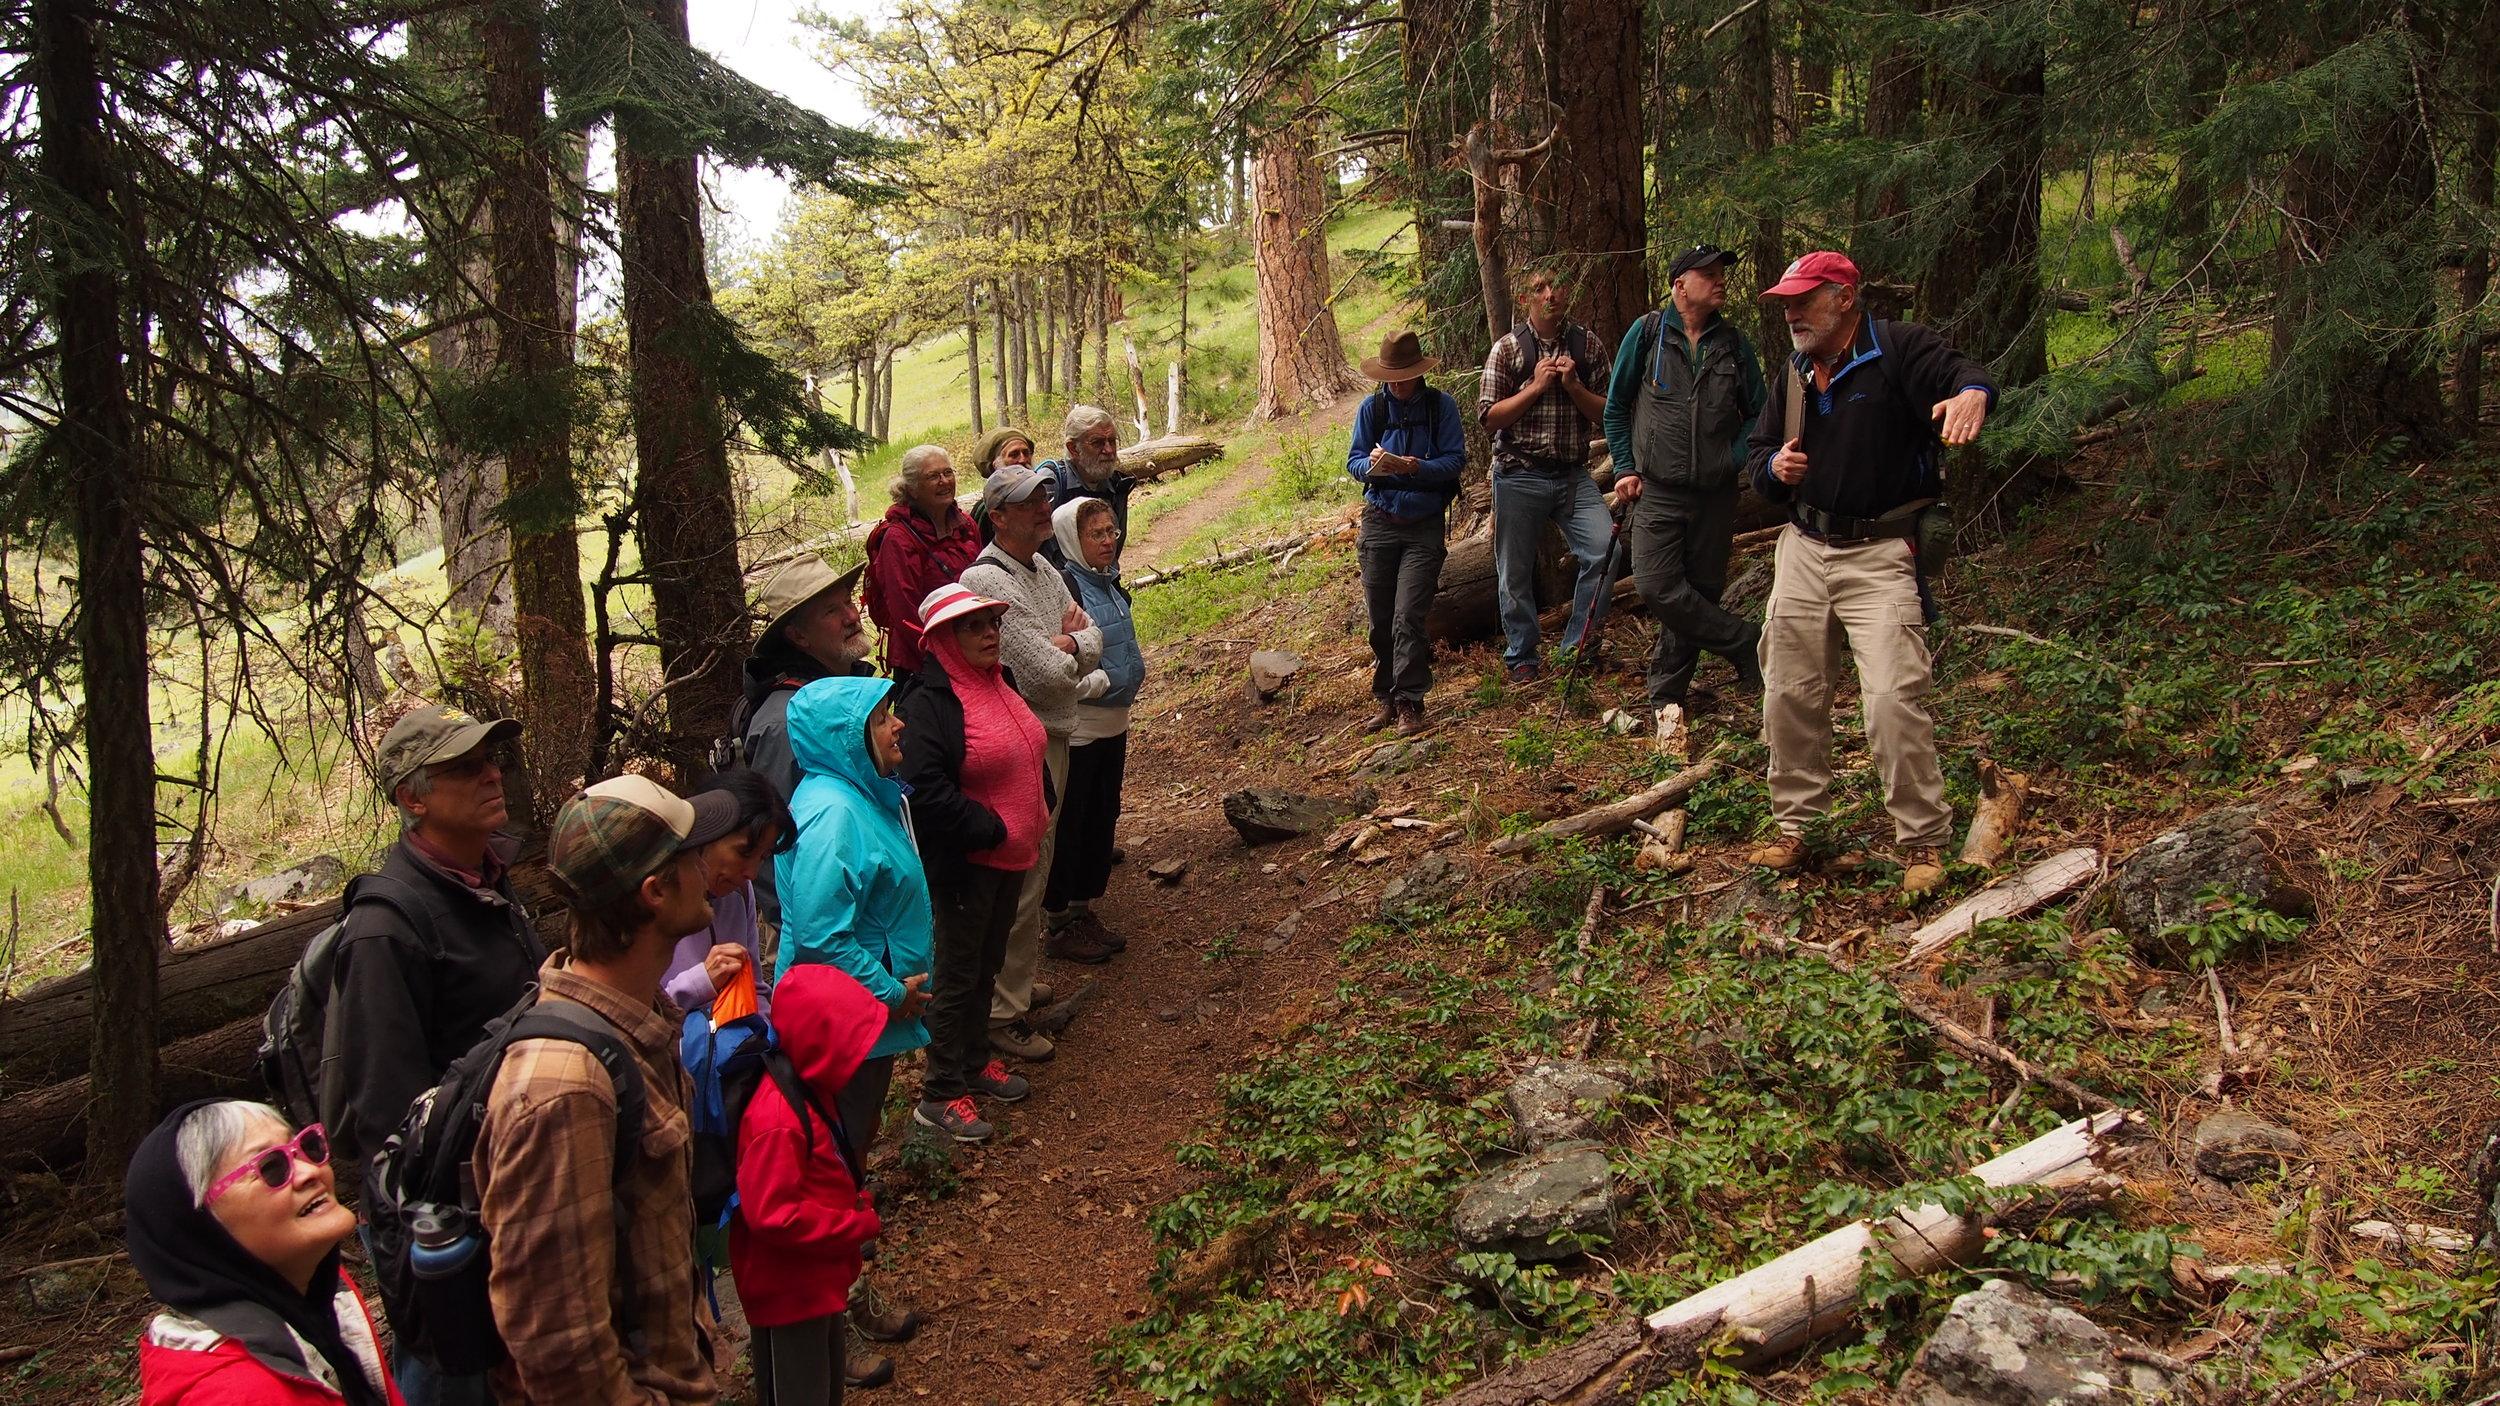 Jad D'Allura (r) explains the tilting of Greensprings Mountain